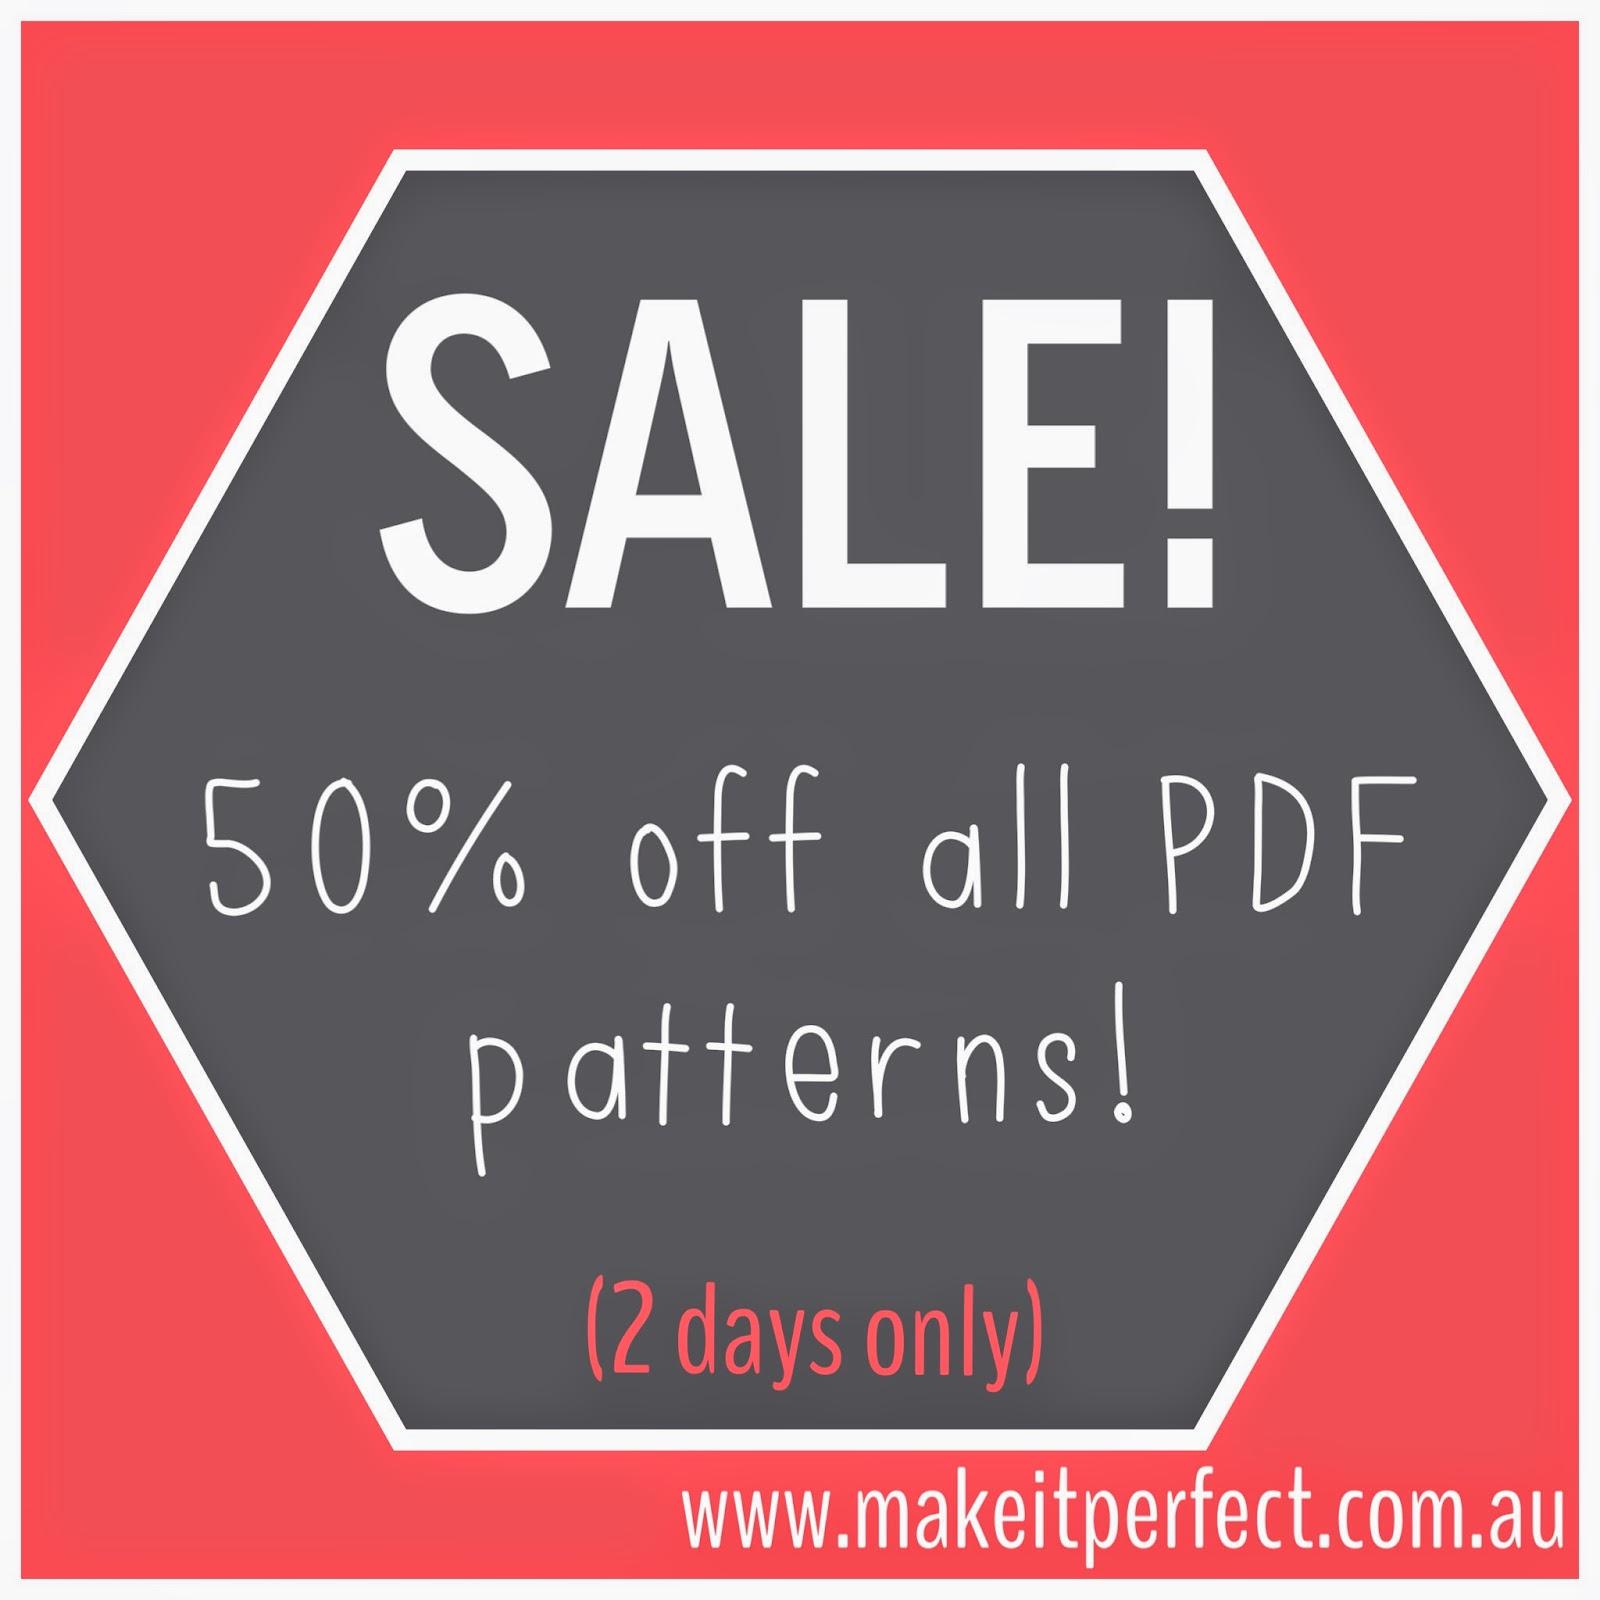 http://www.makeitperfect.com.au/MIP/Instant_Download_Patterns.html